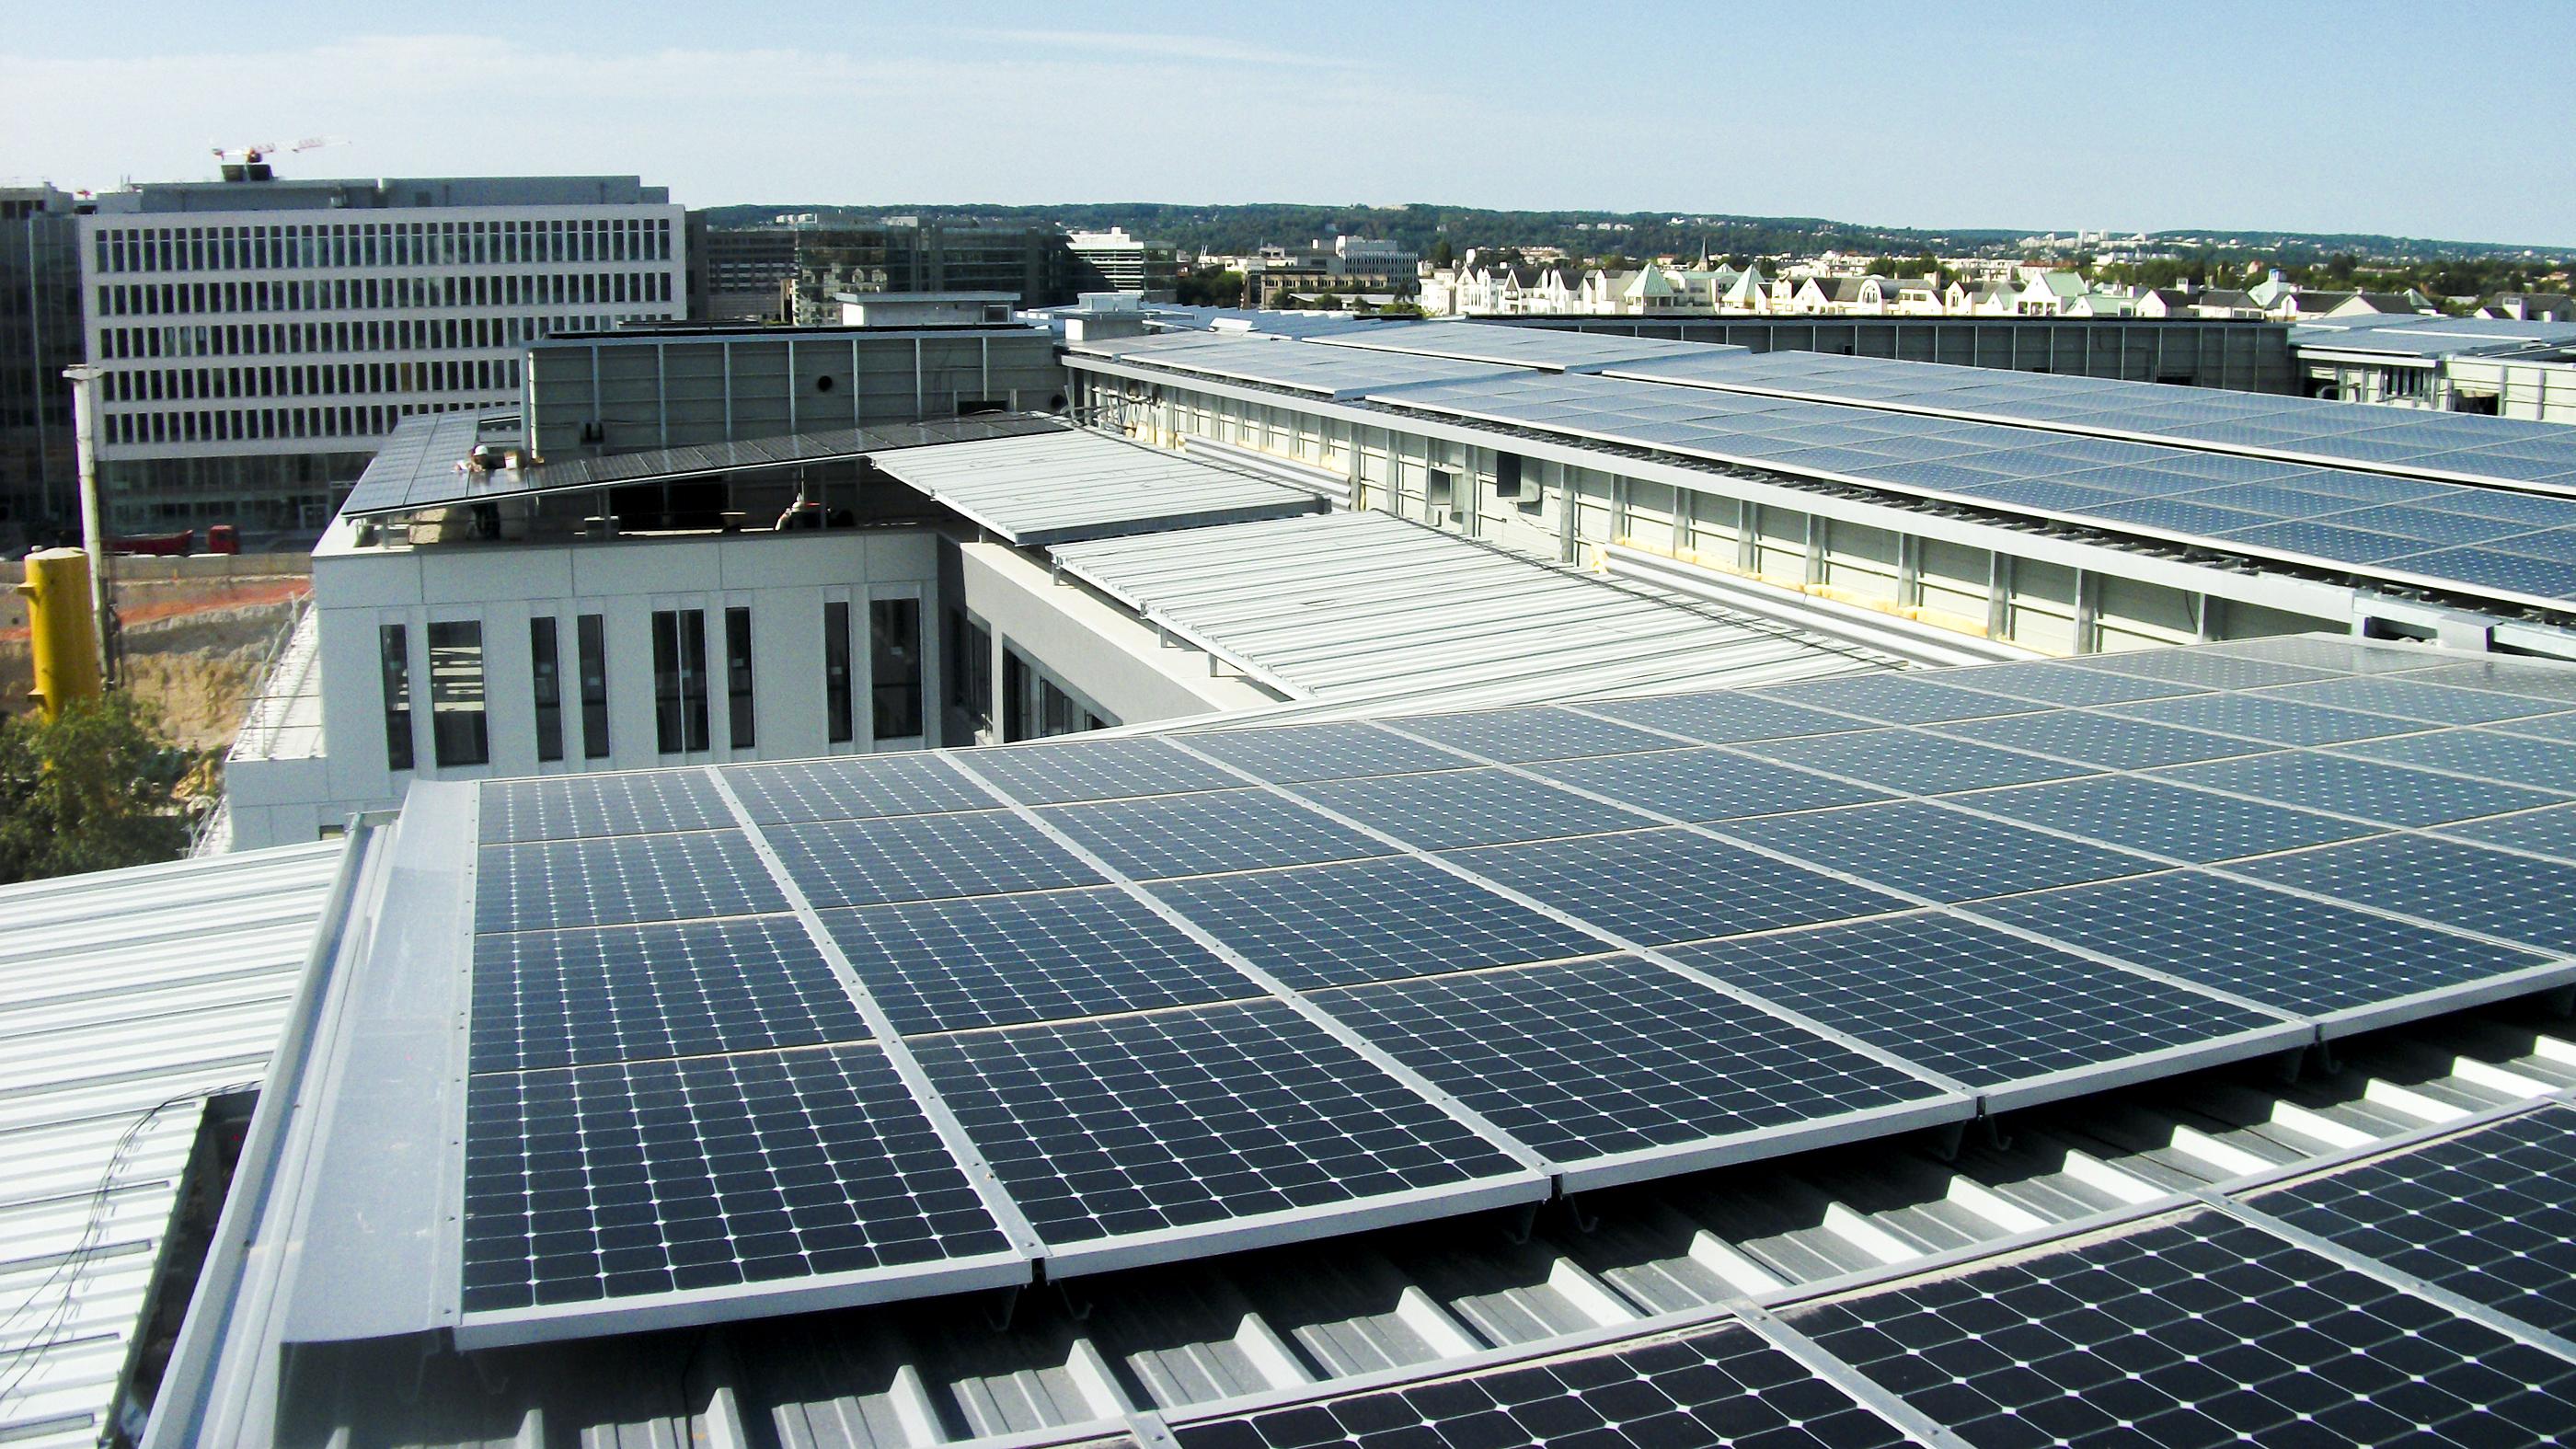 Adiwatt Rooftop Solutions